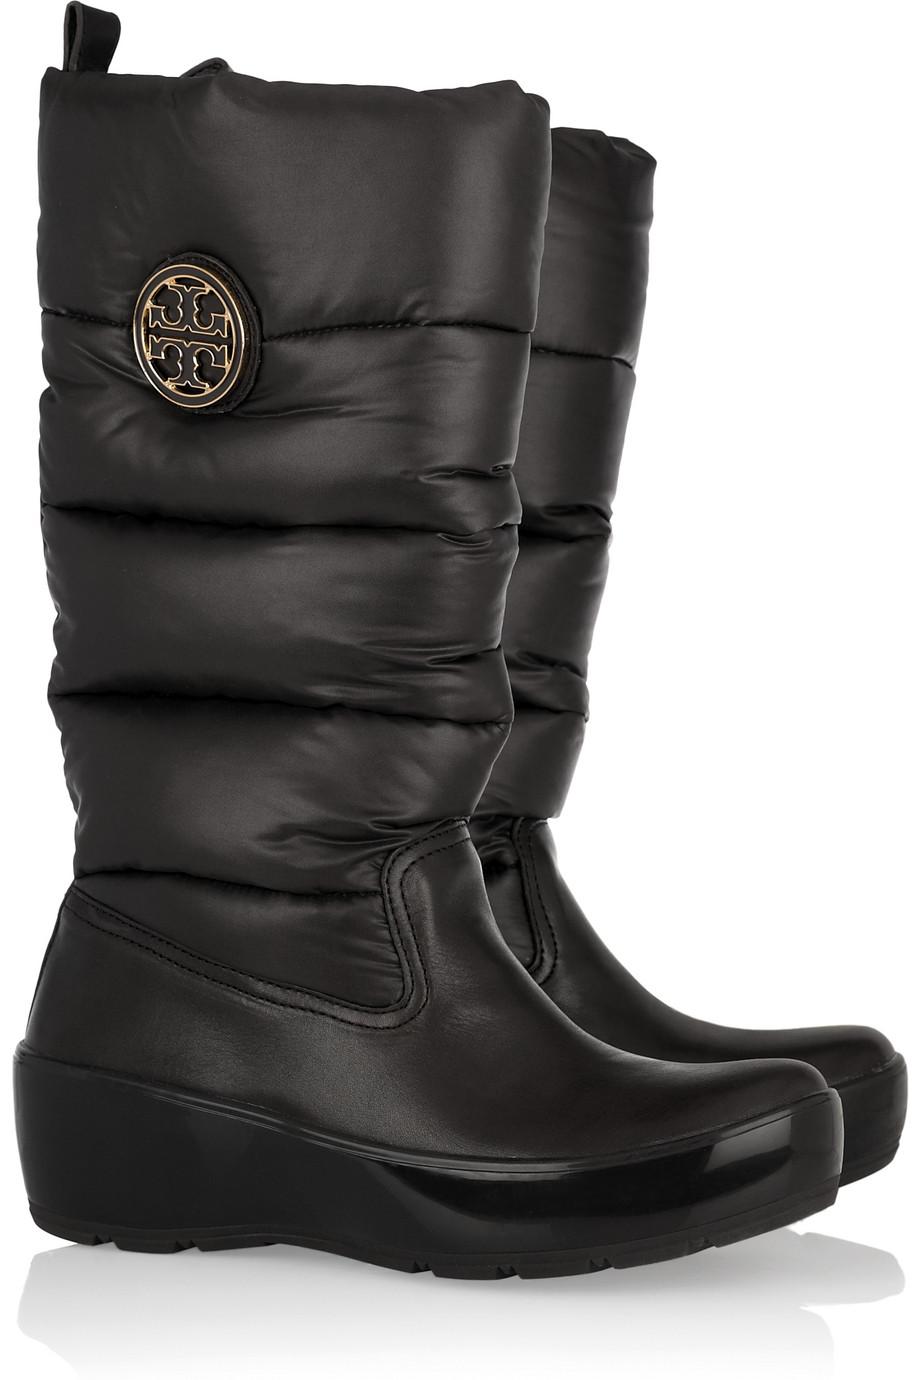 5bc67e66f21 Tory Burch Puffer Boots in Black - Lyst